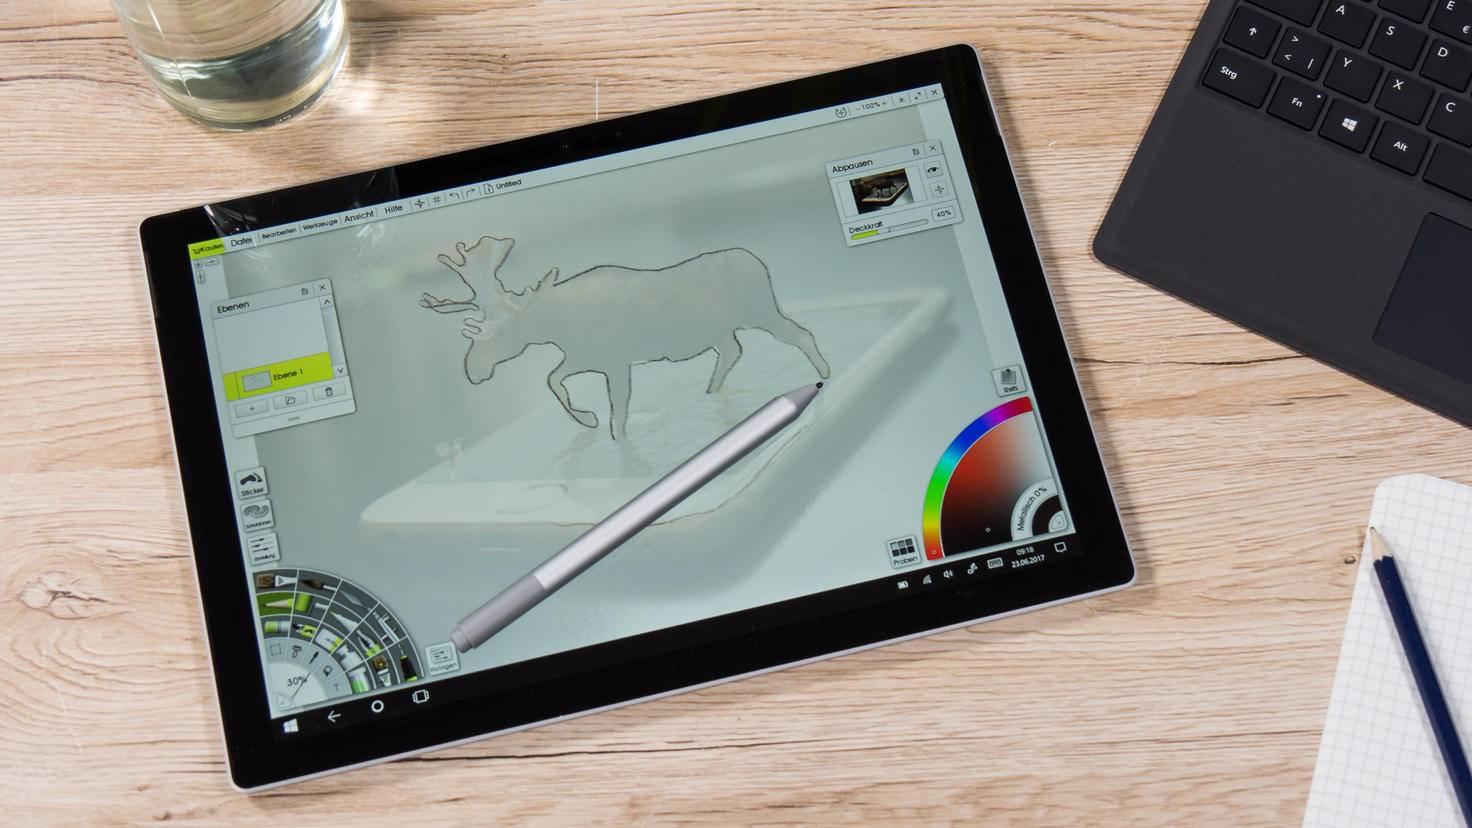 Surface-Pro-2017-6